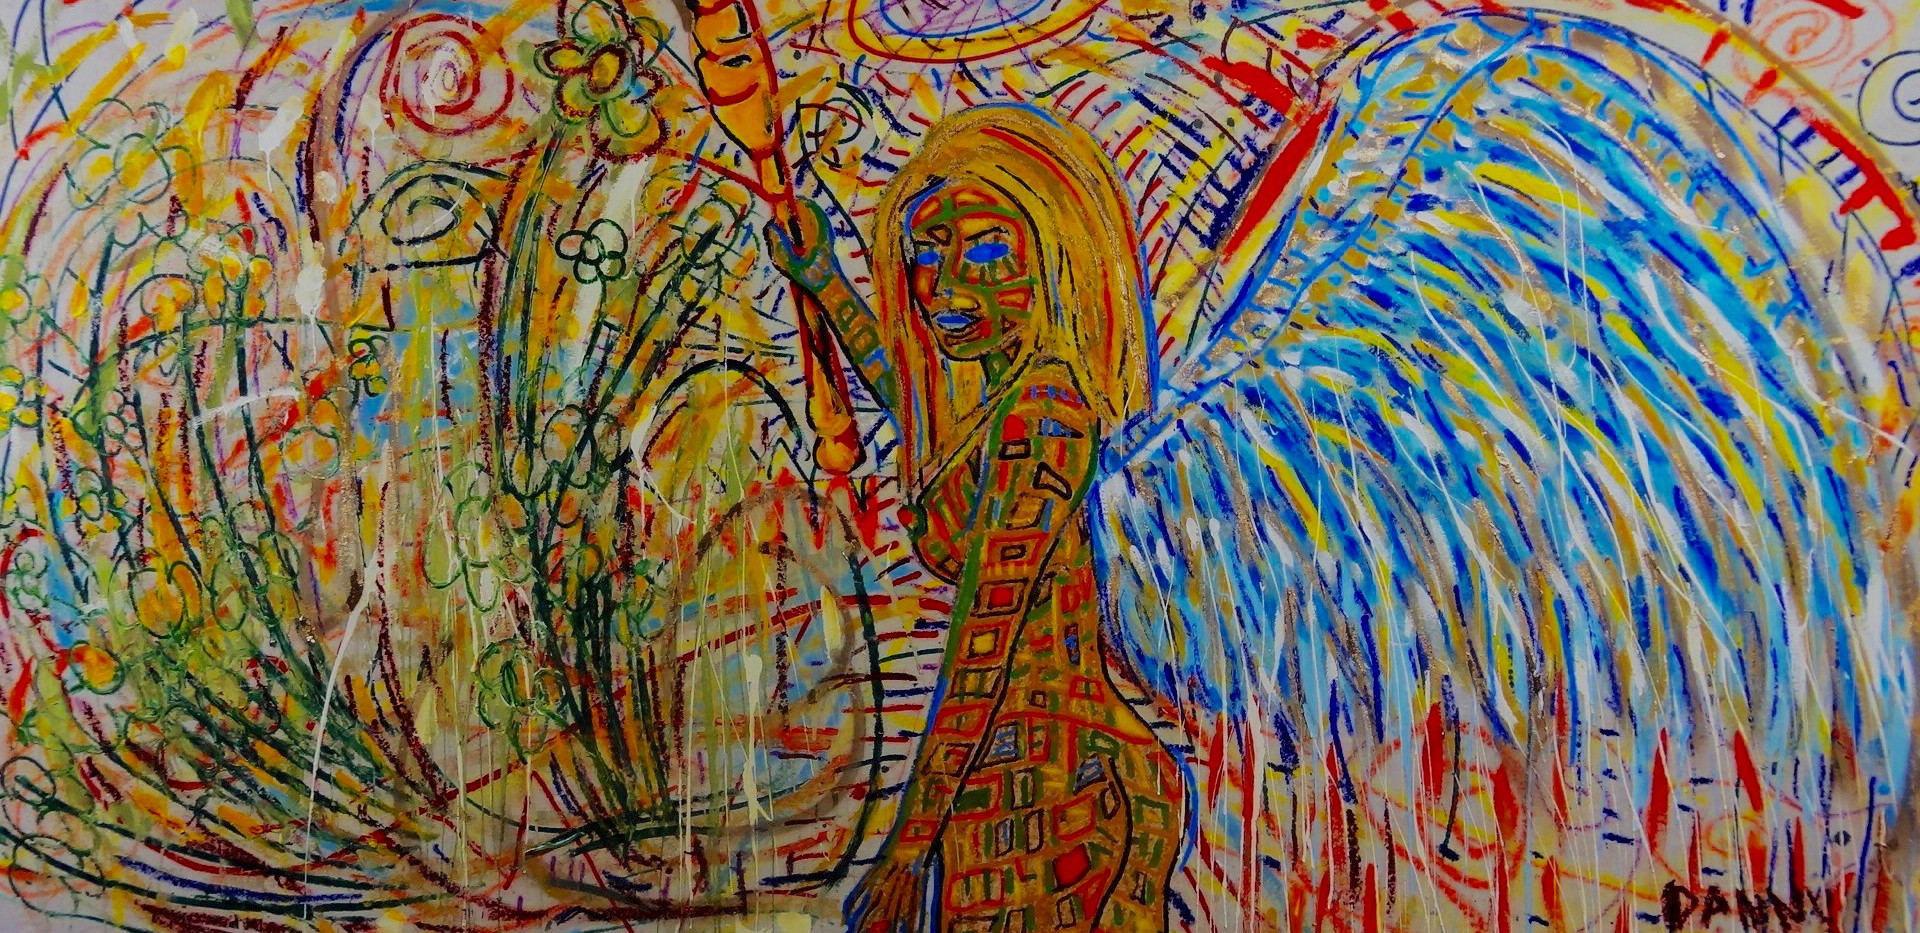 Angel Mostrando el Camino. Mixed Media.